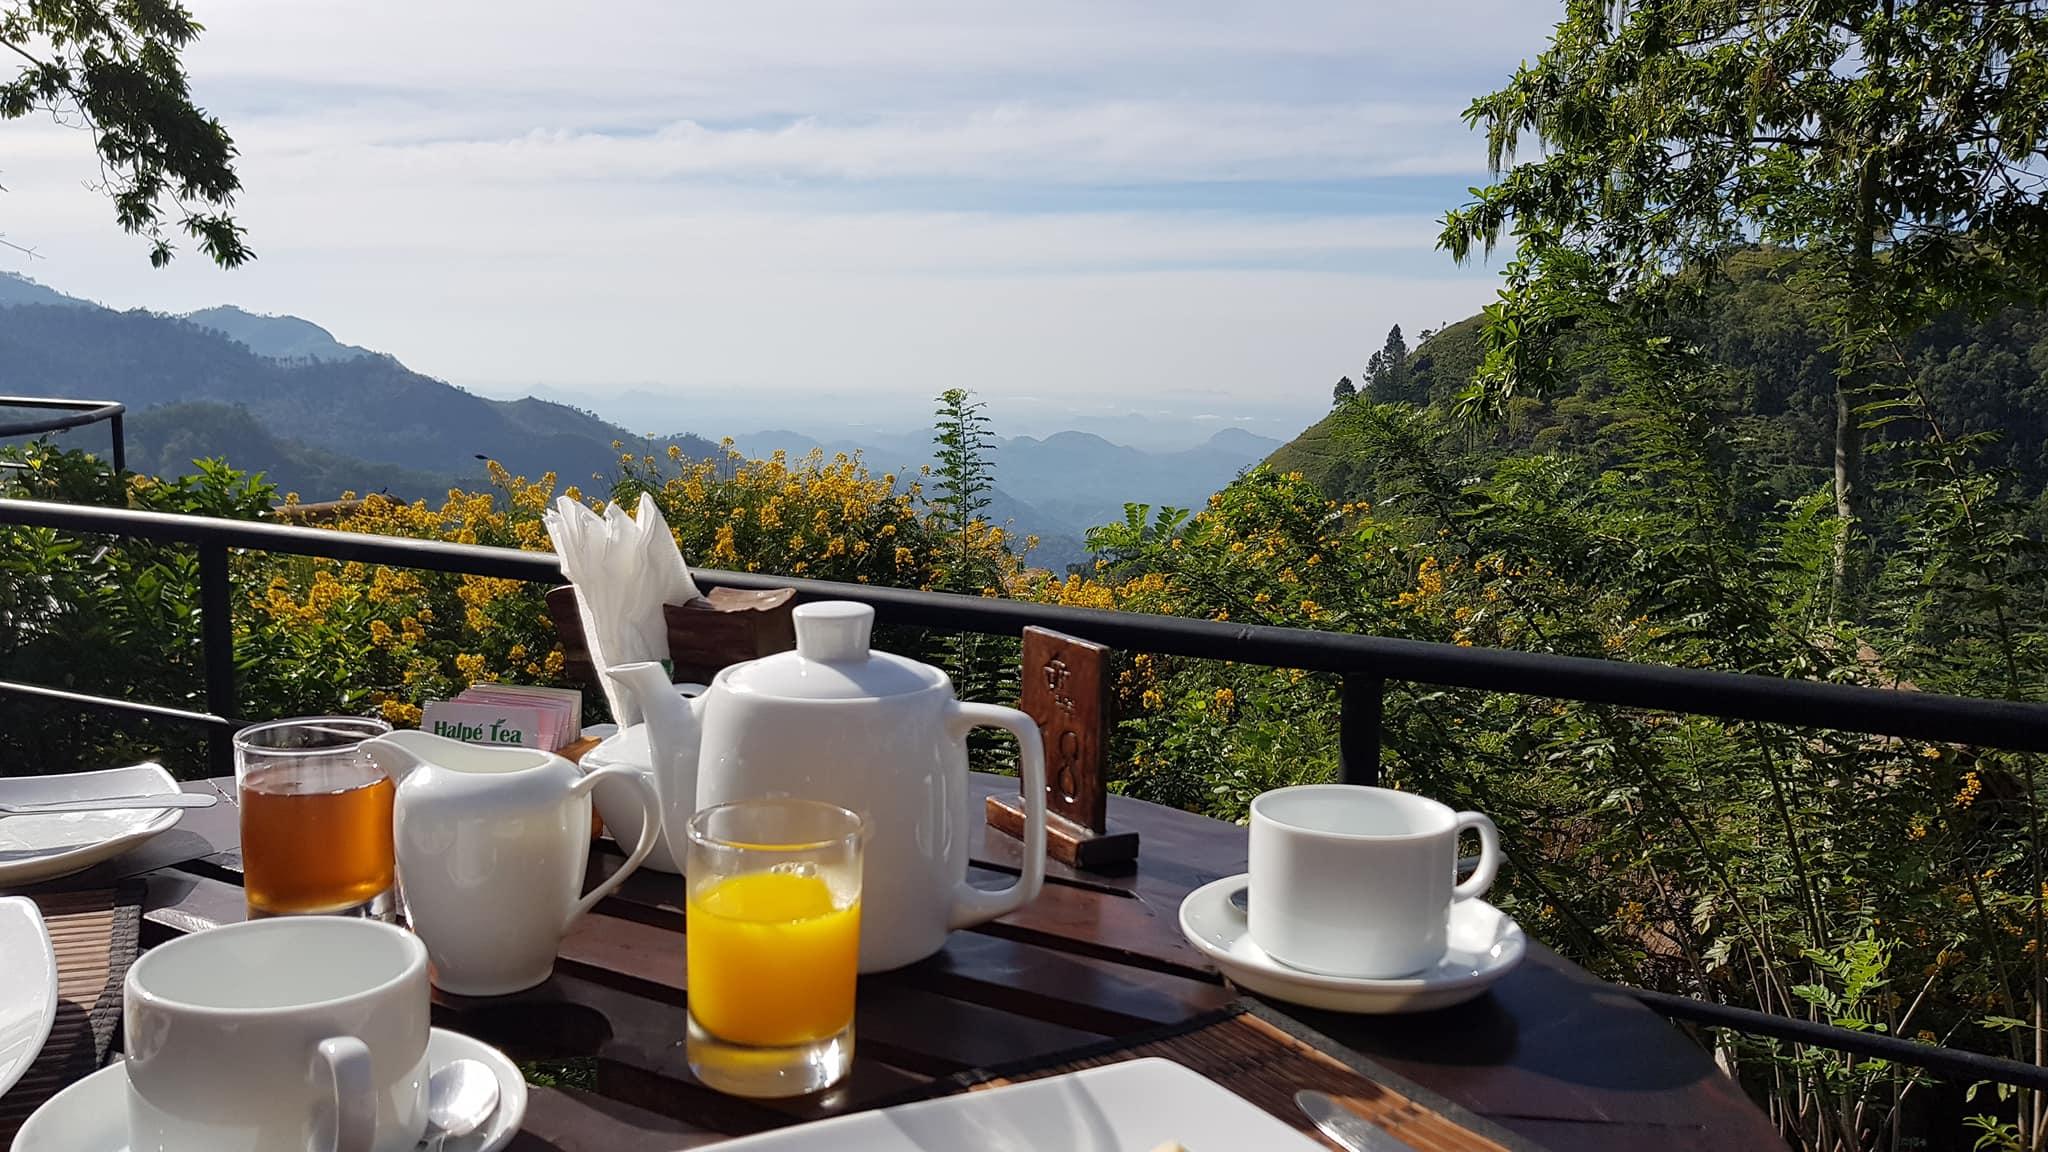 invite-to-paradise-sri-lanka-maldives-holiday-honeymoon-specialists-customer-guest-feedback-zane-lisa-butcher-98-acres-tea-plantation-ella-breakfast.jpg